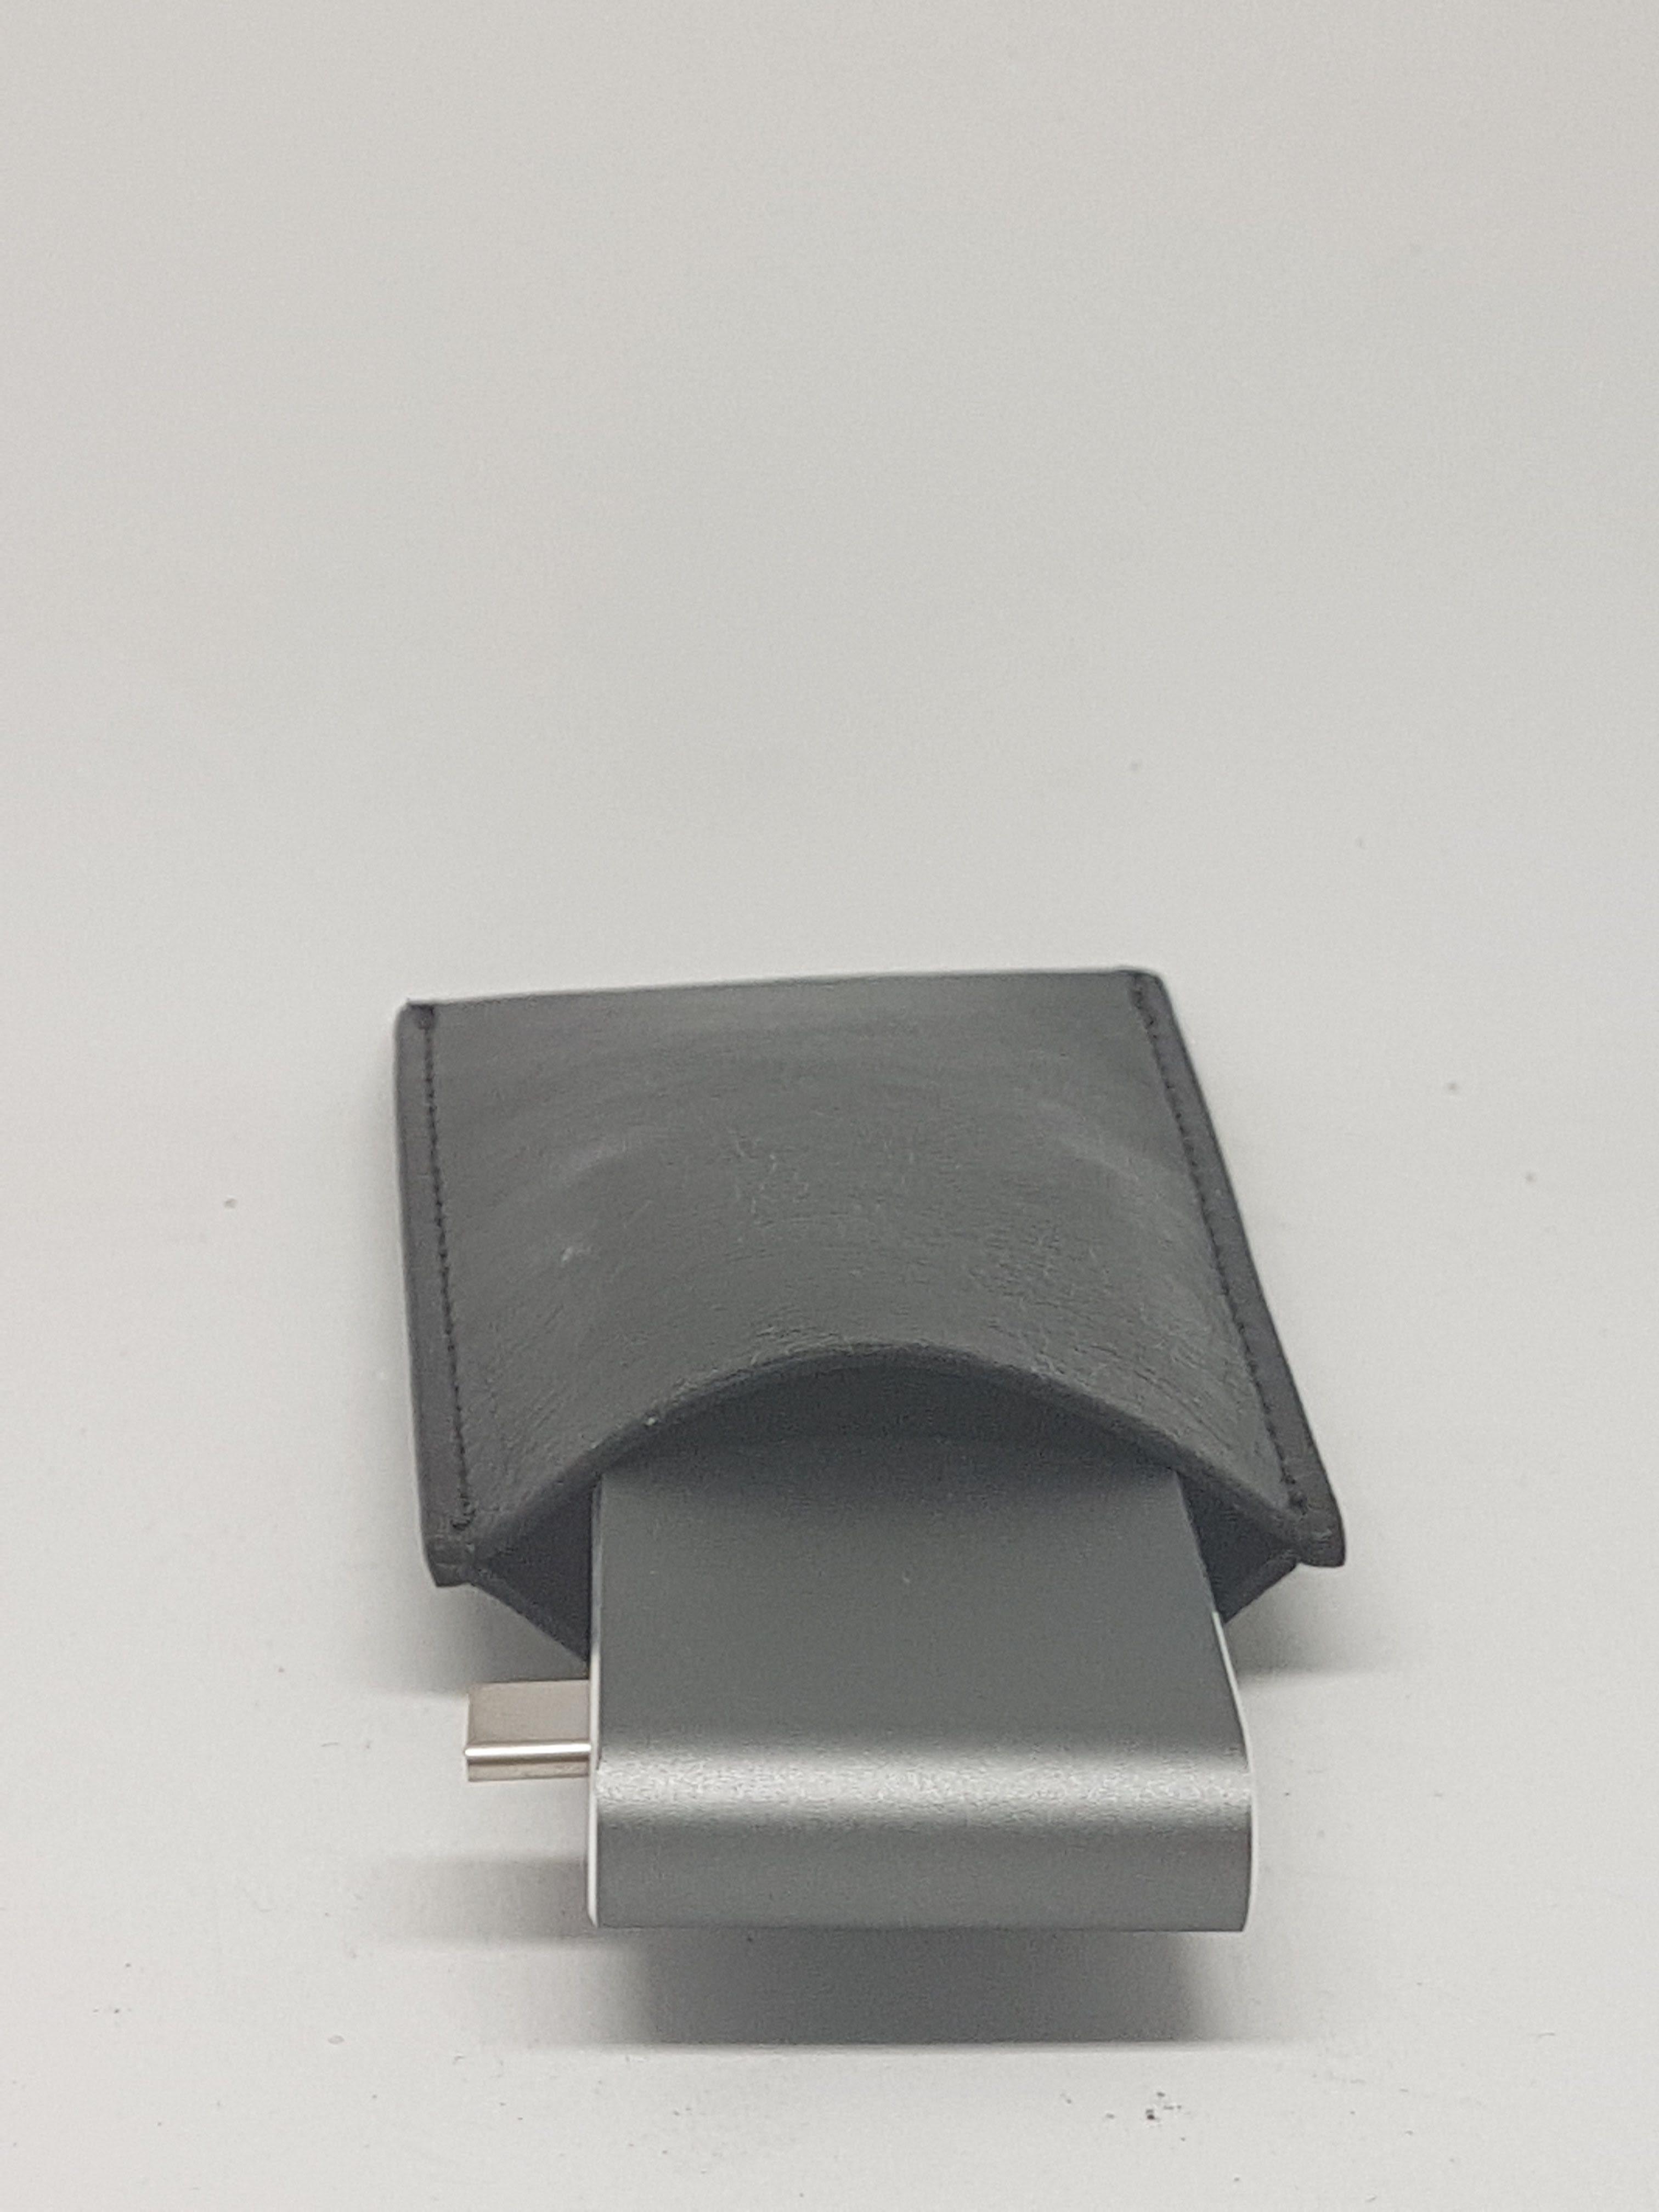 AOPETIO-Hub-USB-C - AOPETIO-Hub-USB-C-24.jpg